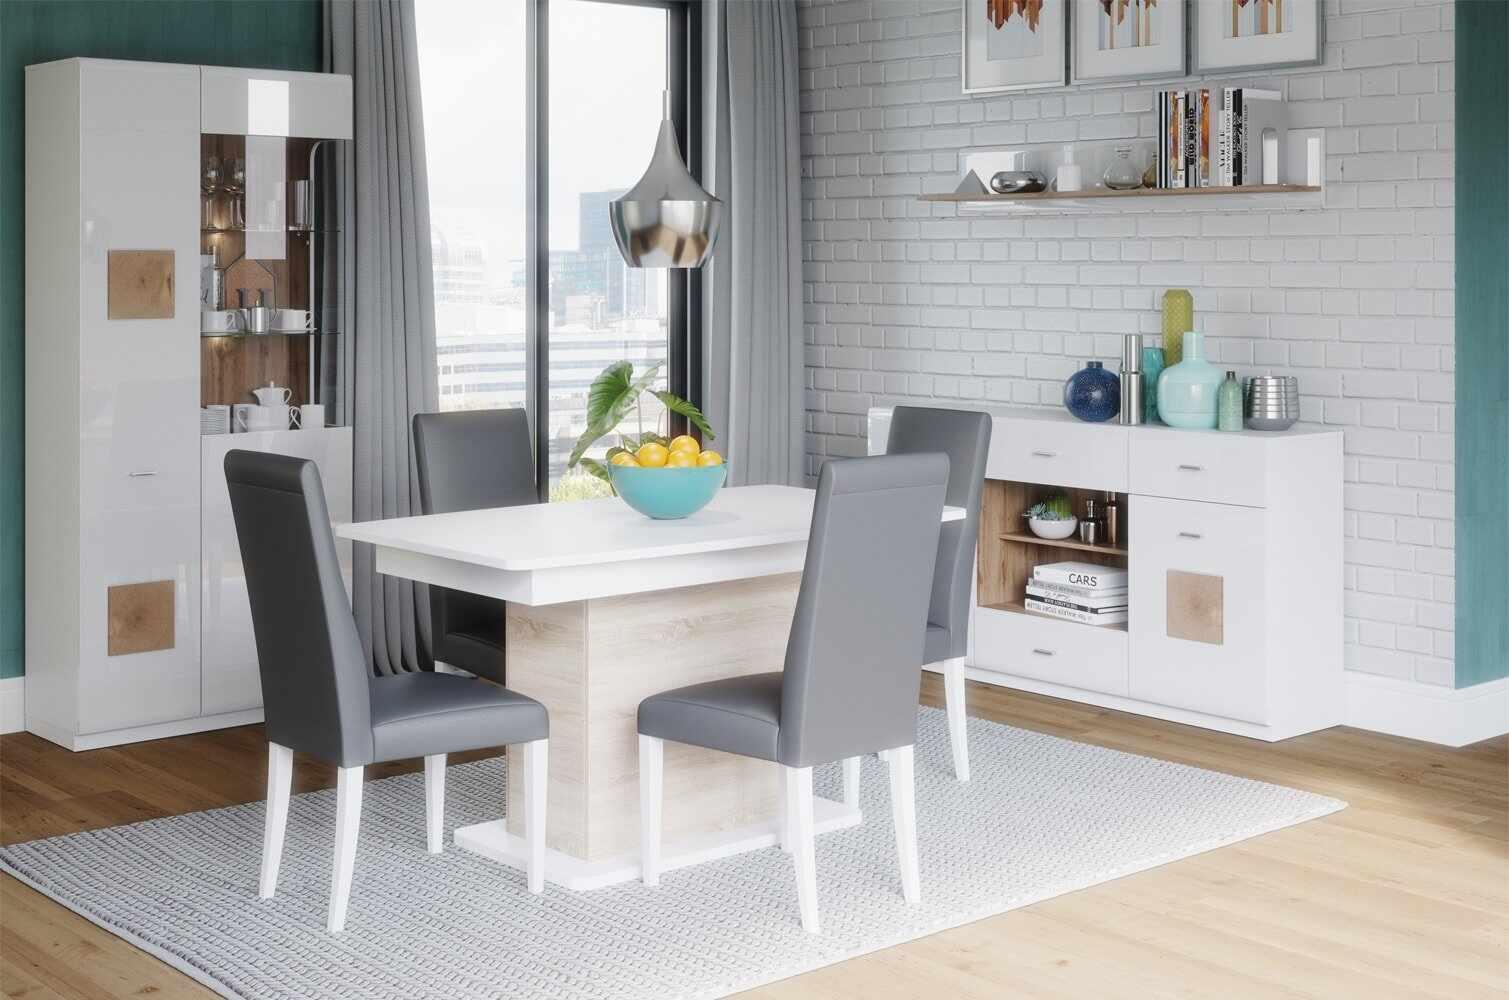 Set de mobila dining din pal, 4 piese Wood Alb / Stejar Wotan la pret 4033 lei